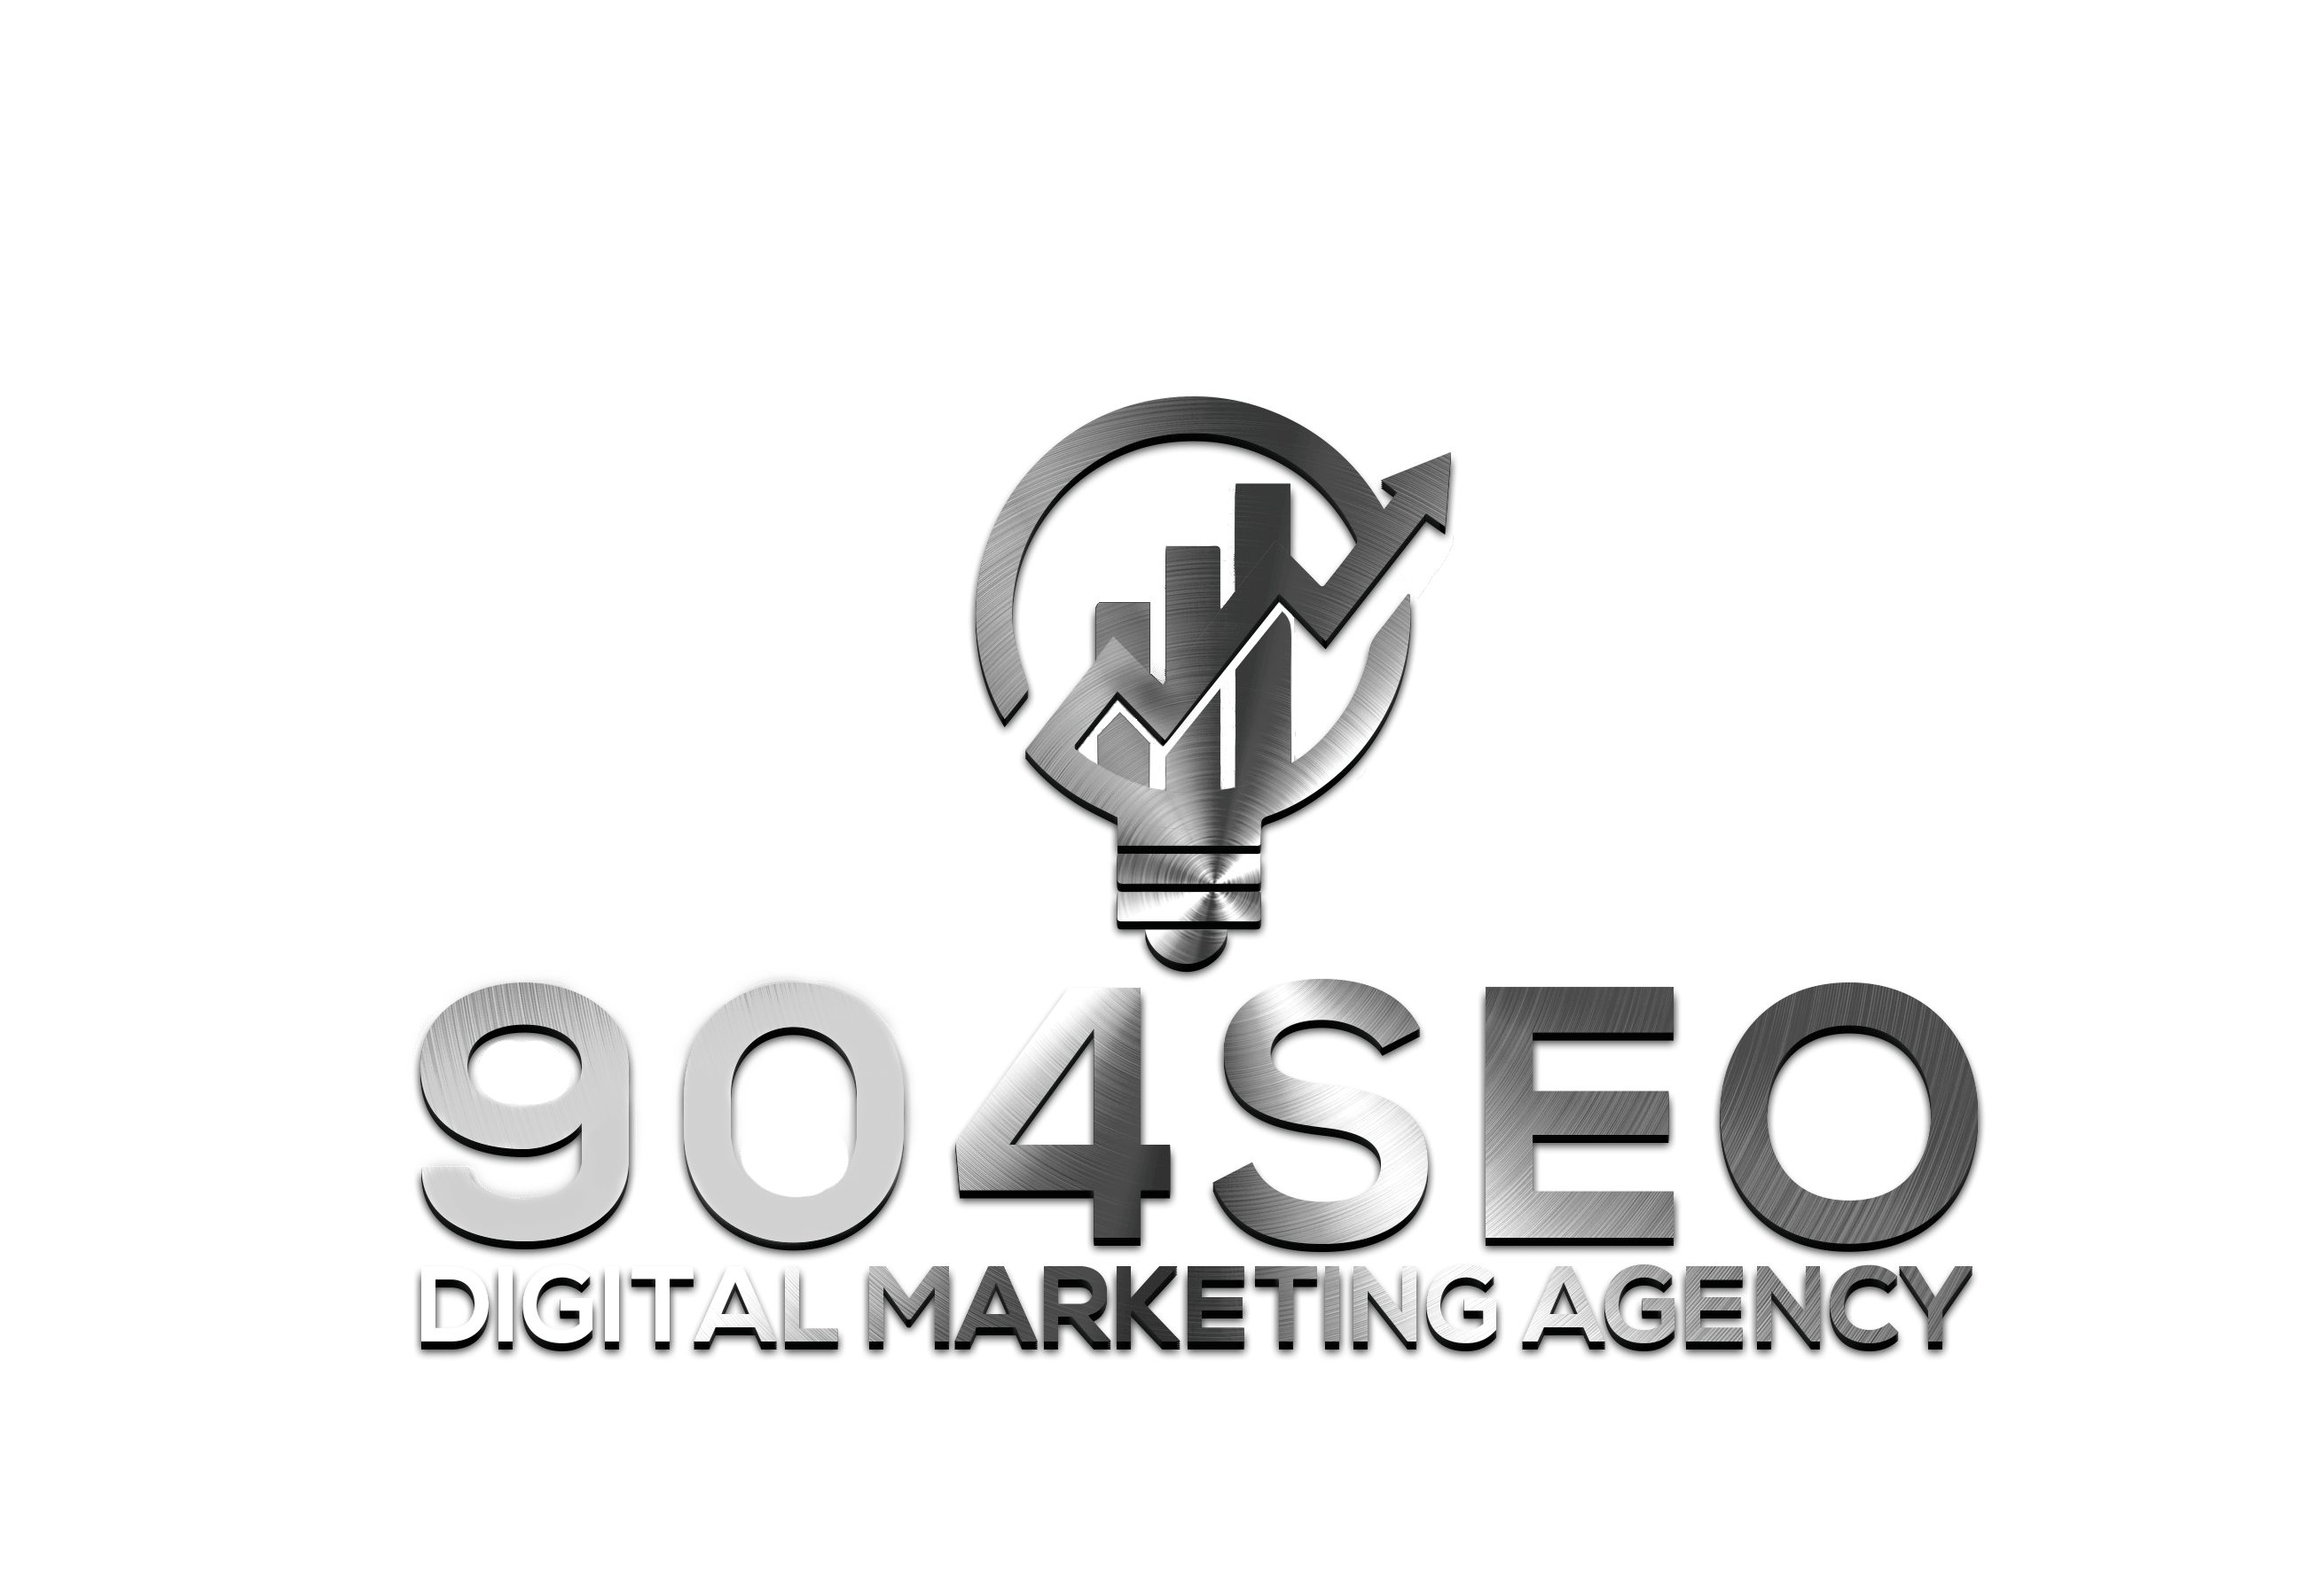 904SEO Logo